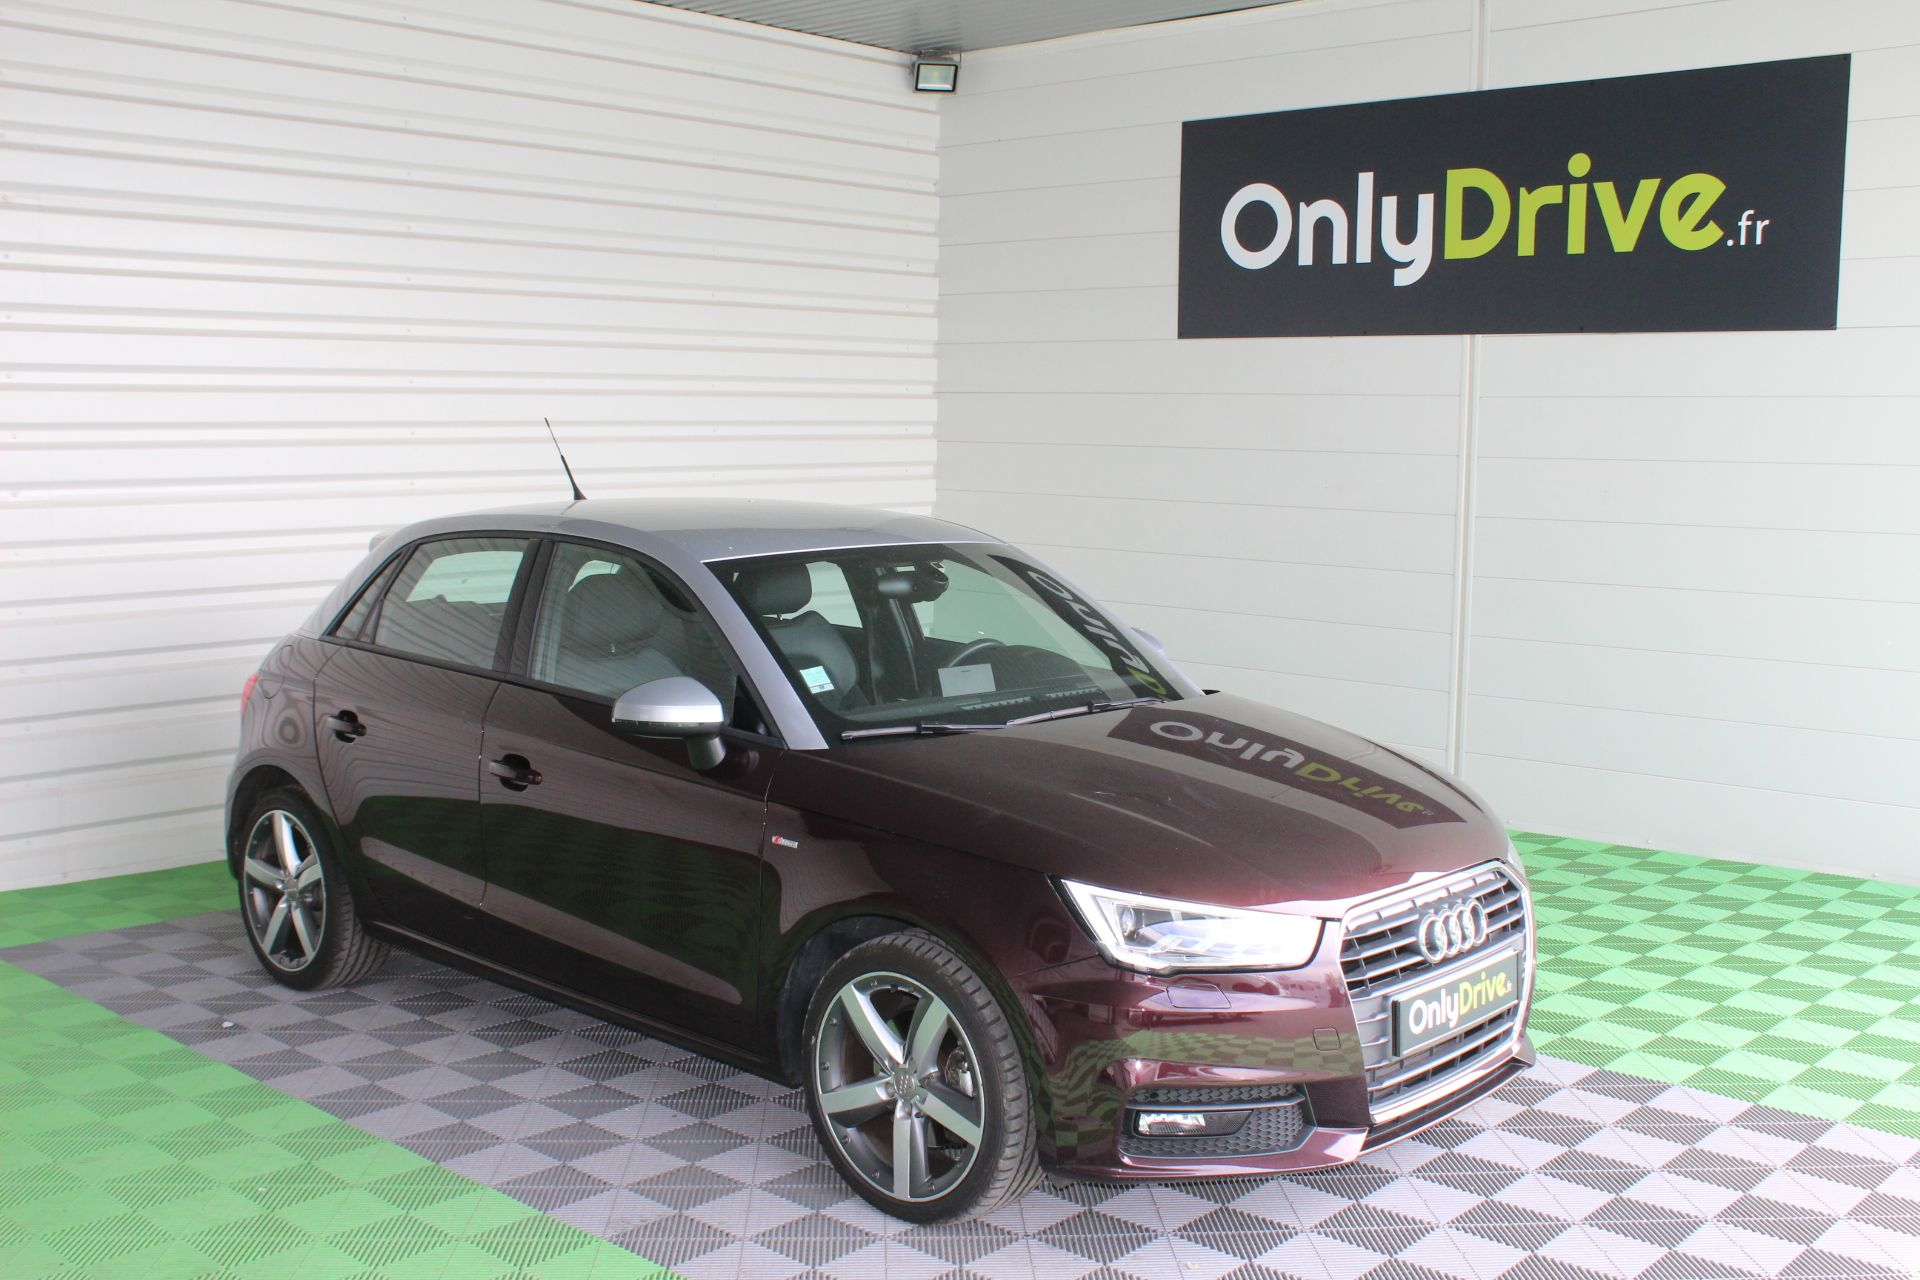 Audi A1 Sportback 1 6 Tdi 116 S Tronic 7 S Line Bordeaux 2015